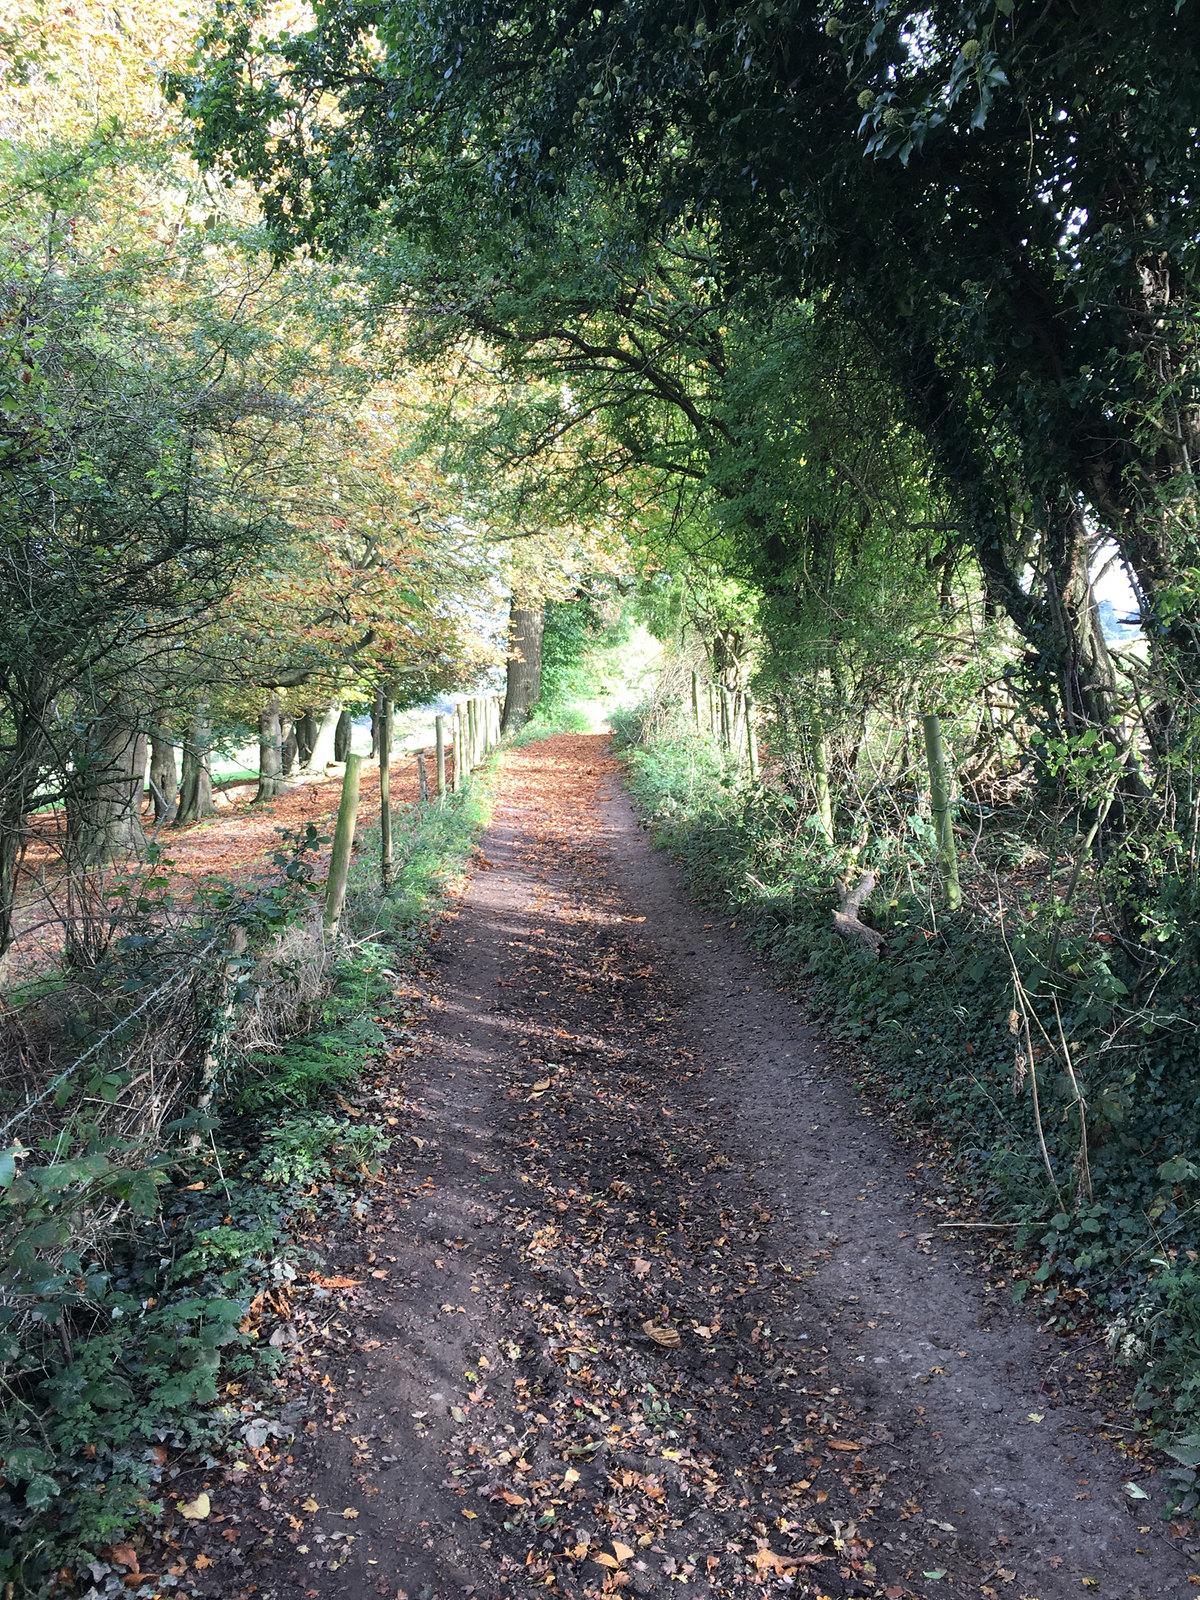 2017-10-08 08.57.47 Woldingham Circular